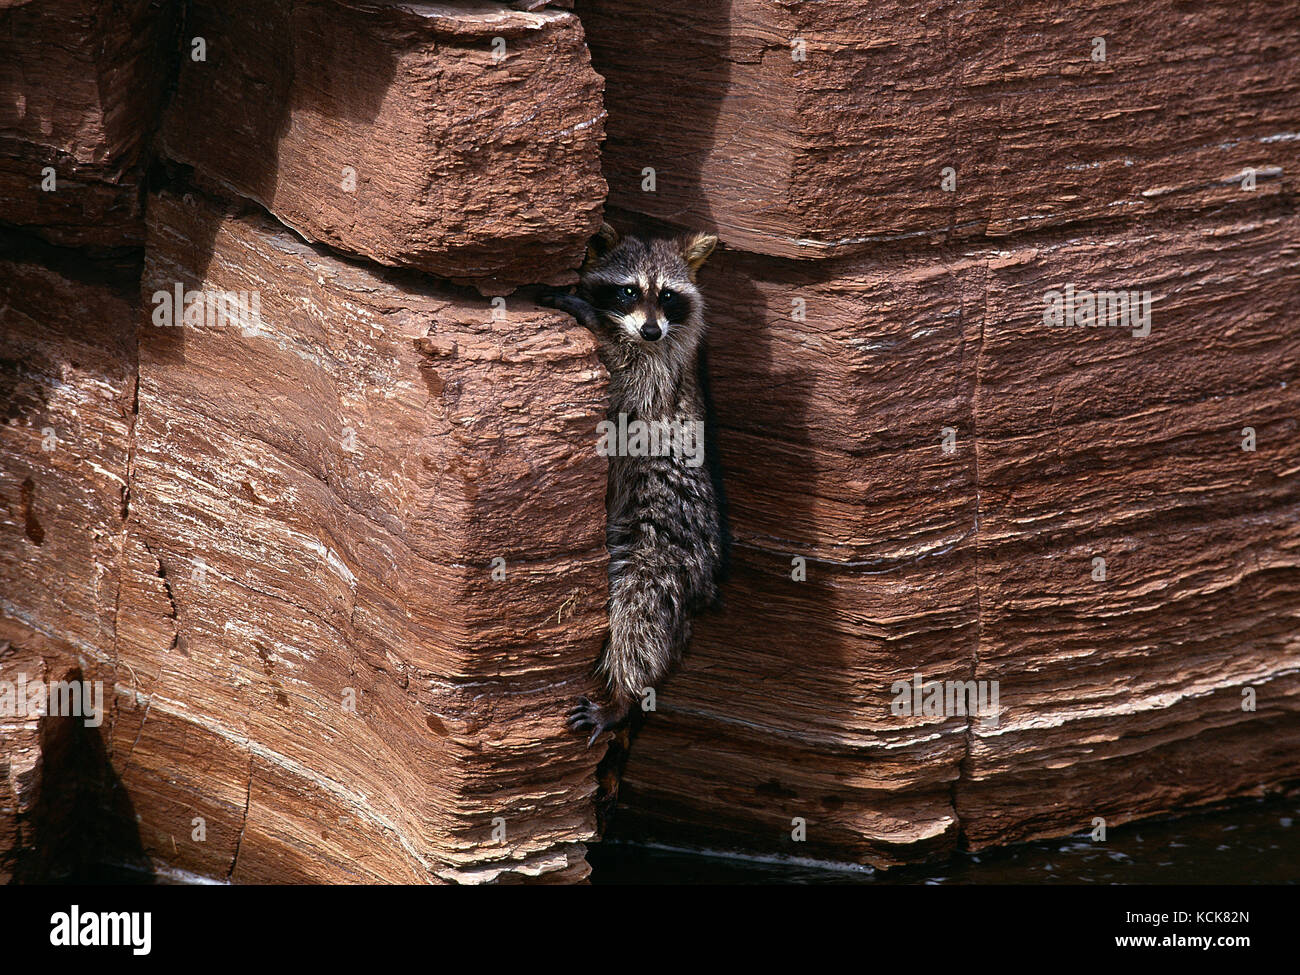 USA. Utah. Canyon Lands National Park. Wildlife. Raccoon clinging to crack in riverside rock. - Stock Image